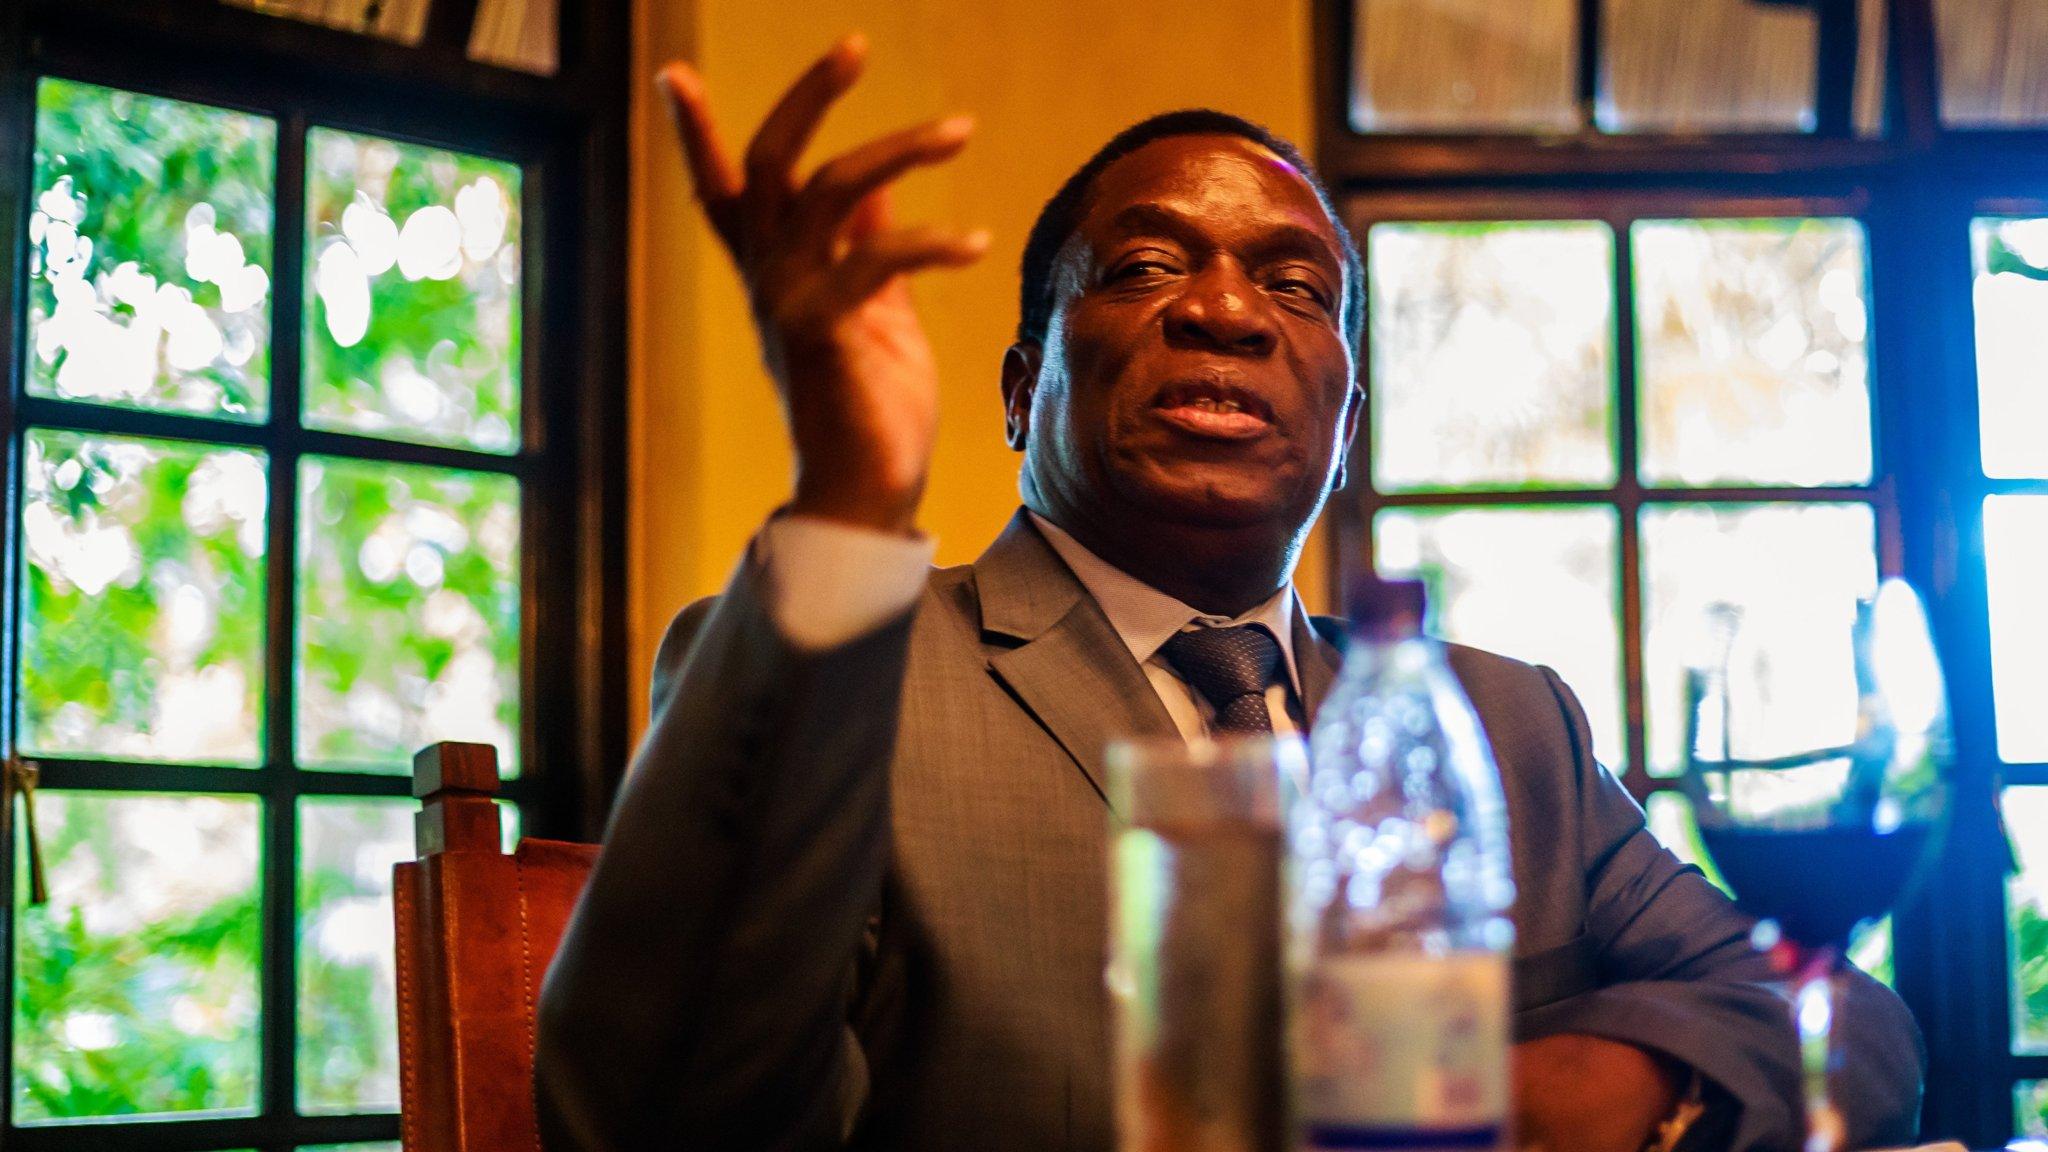 Zimbabwe's new president seeks to build bridges with the west